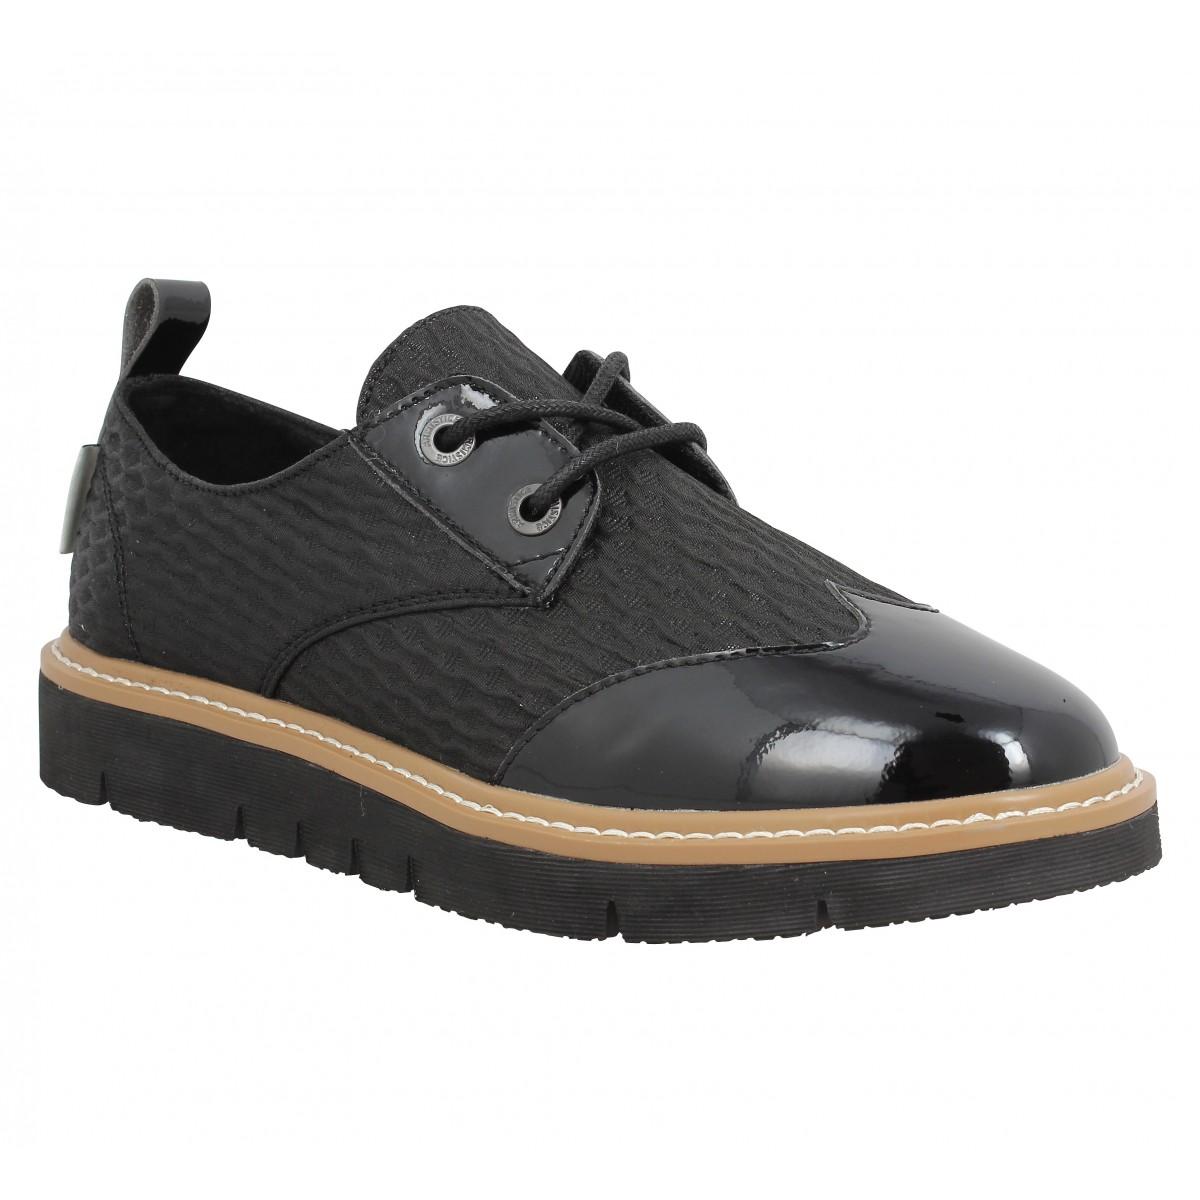 soldes armistice fox derby noir femme fanny chaussures. Black Bedroom Furniture Sets. Home Design Ideas